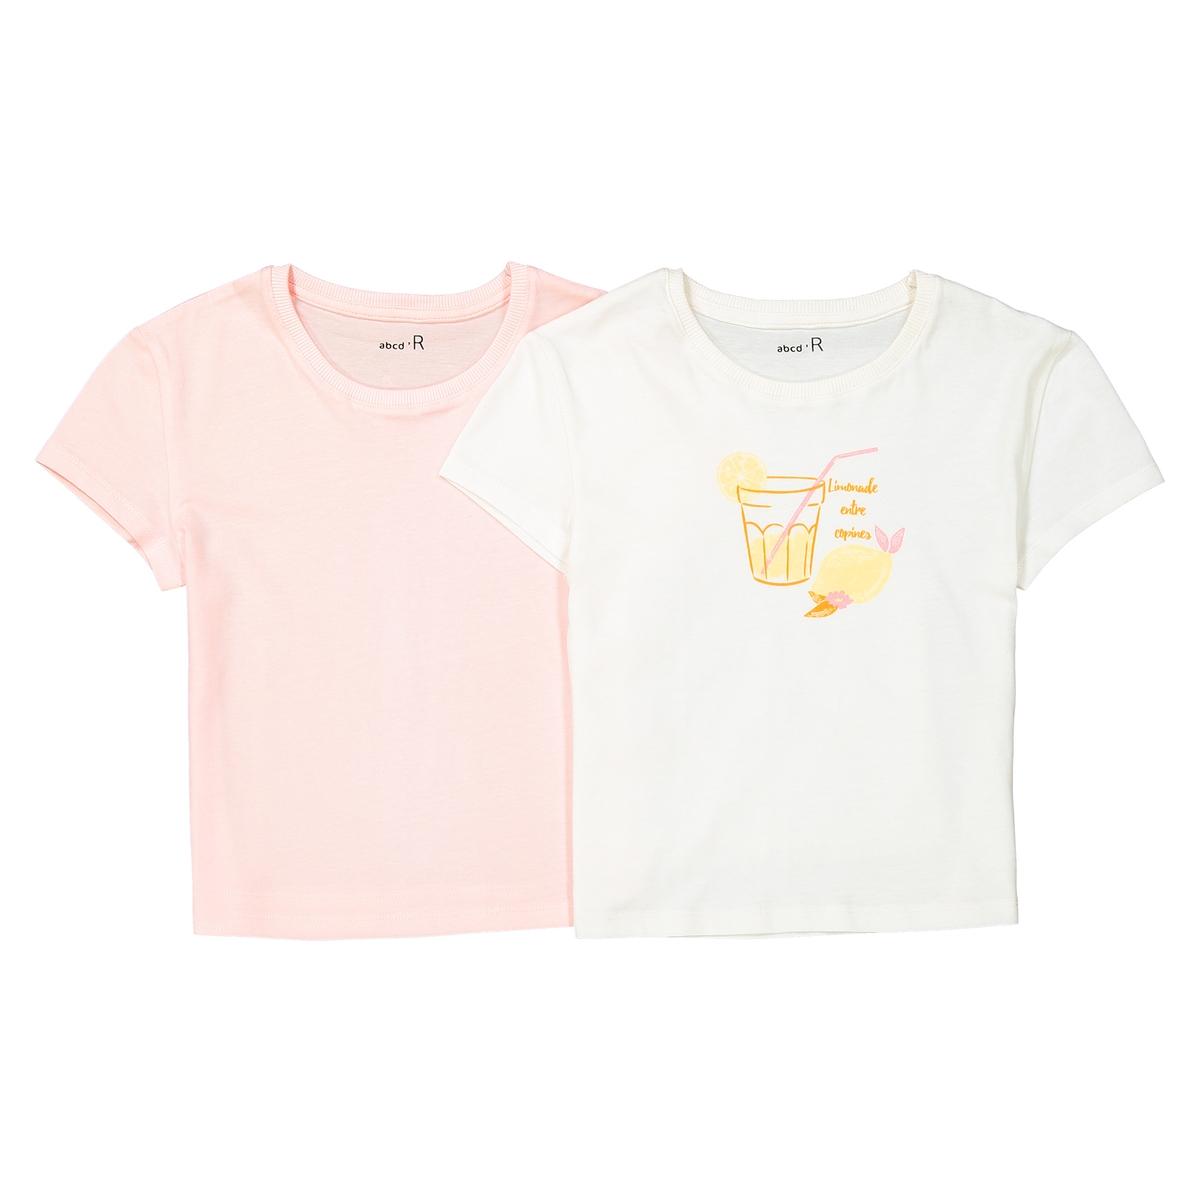 Confezione da 2 t-shirt fantasia da 3 a 12 anni